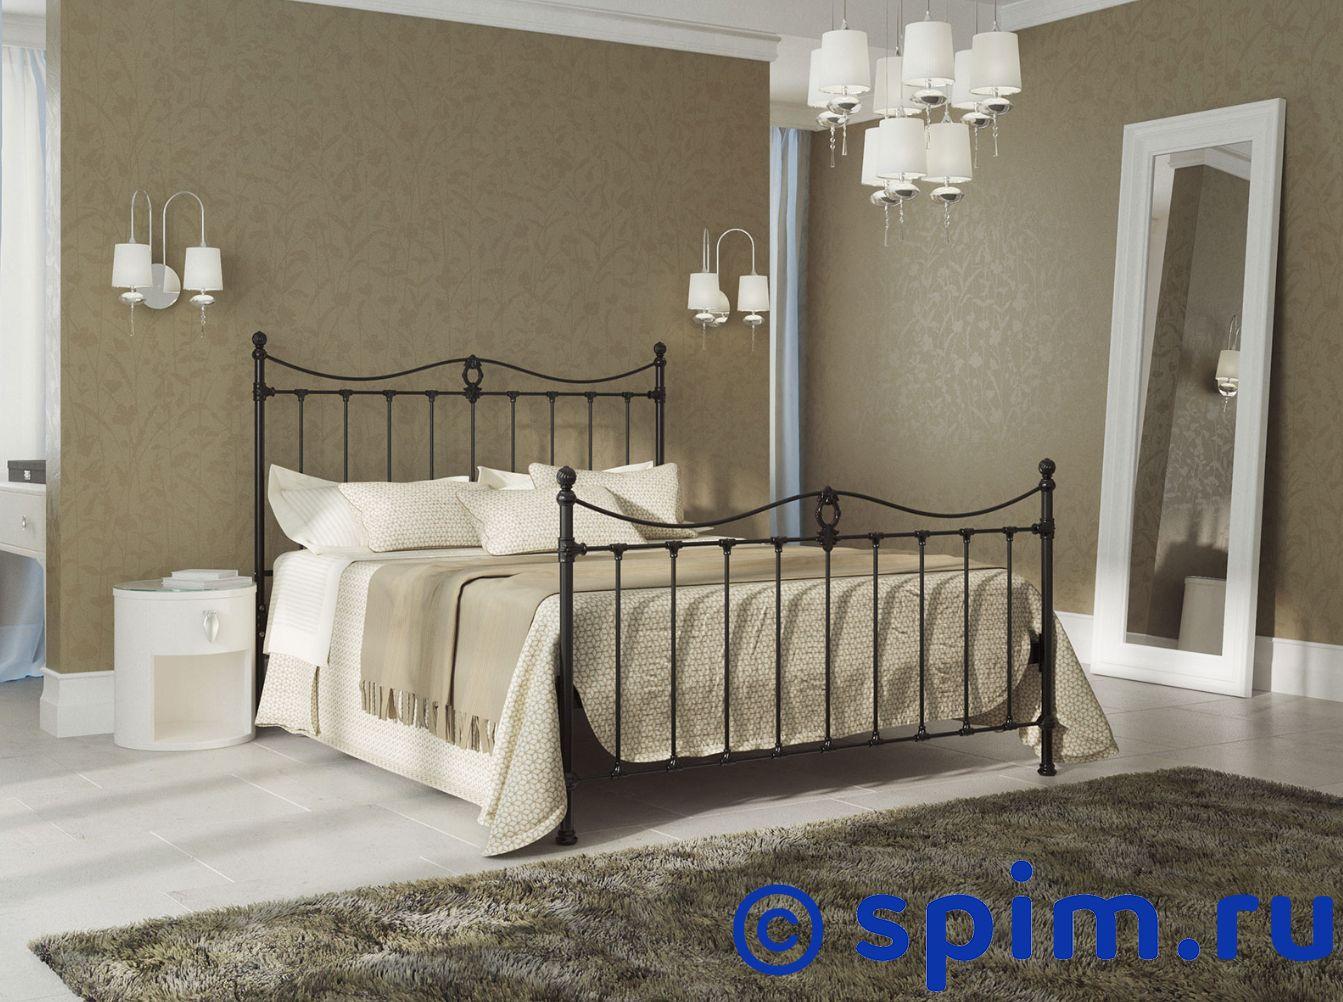 Кровать Originals by Dreamline Taya (1 спинка) 140х190 см матрас dreamline springless soft slim 90х195 см